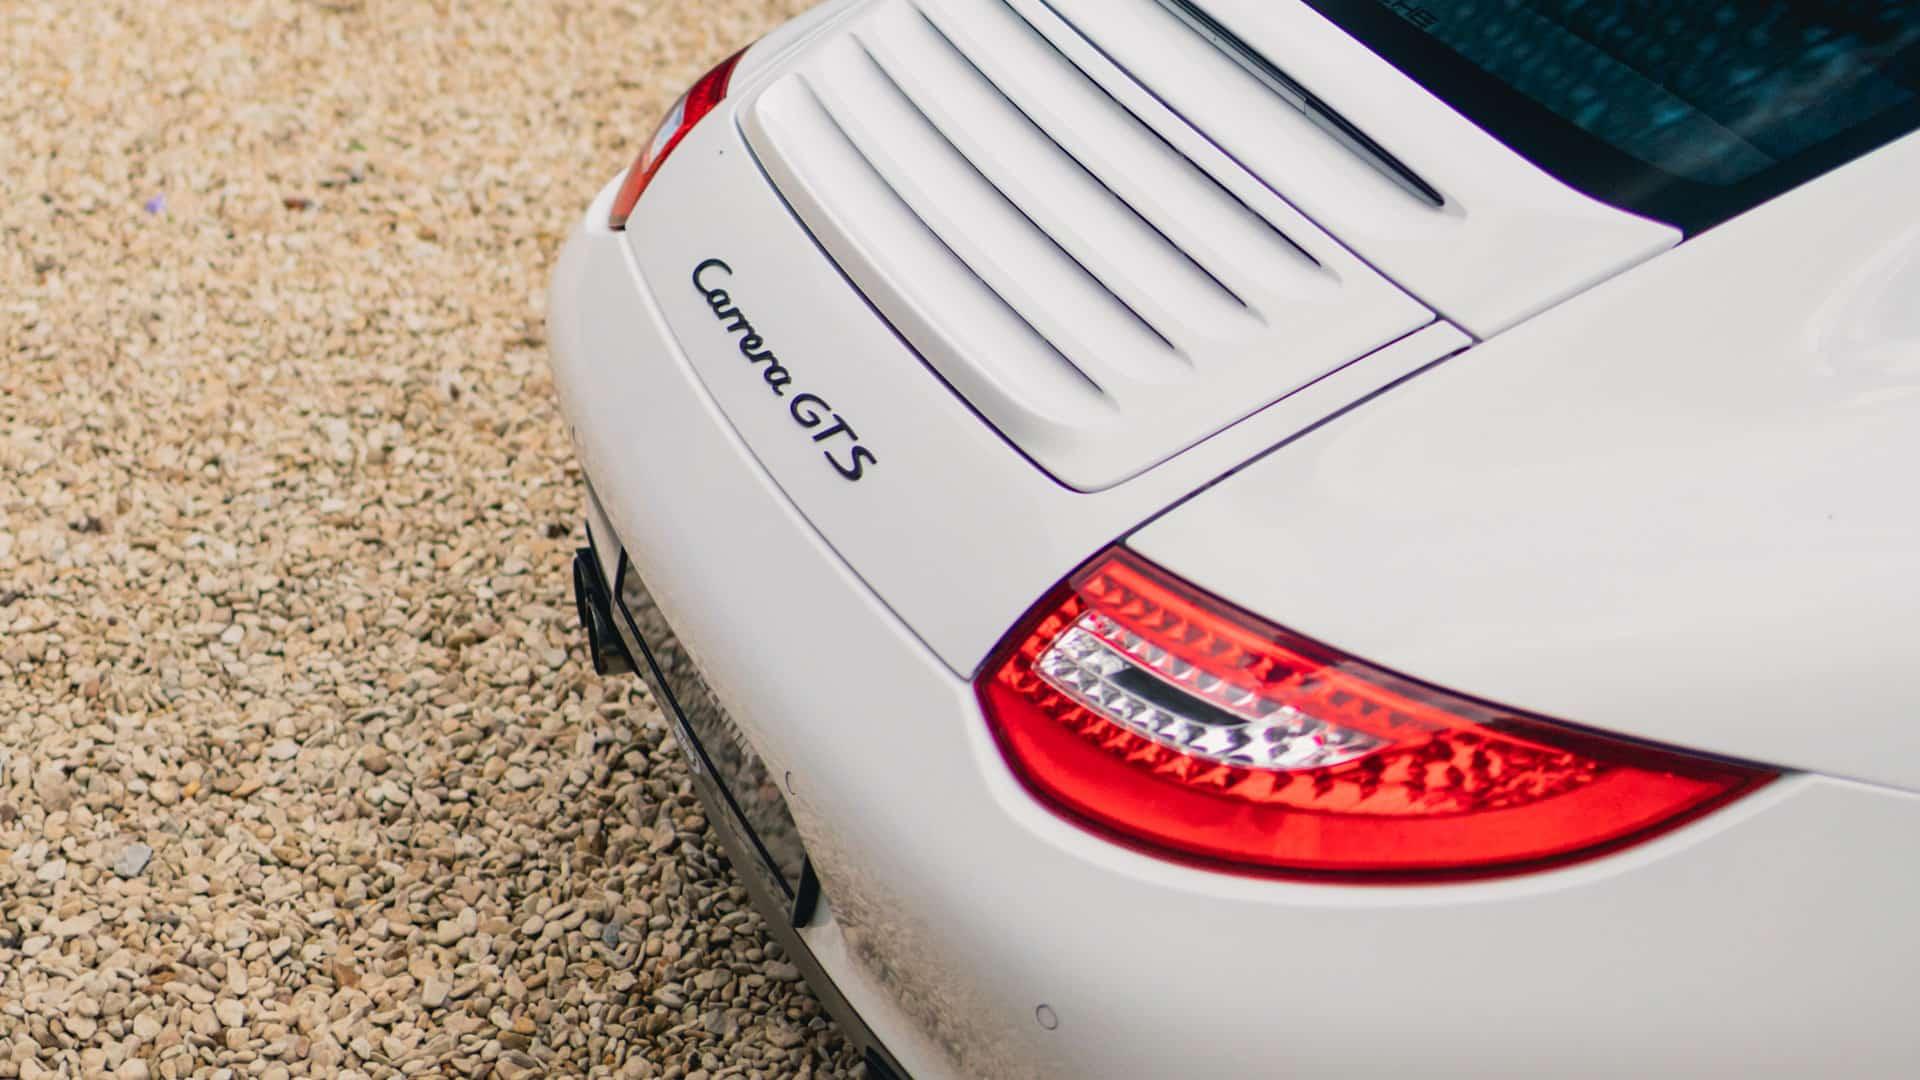 997 GTS